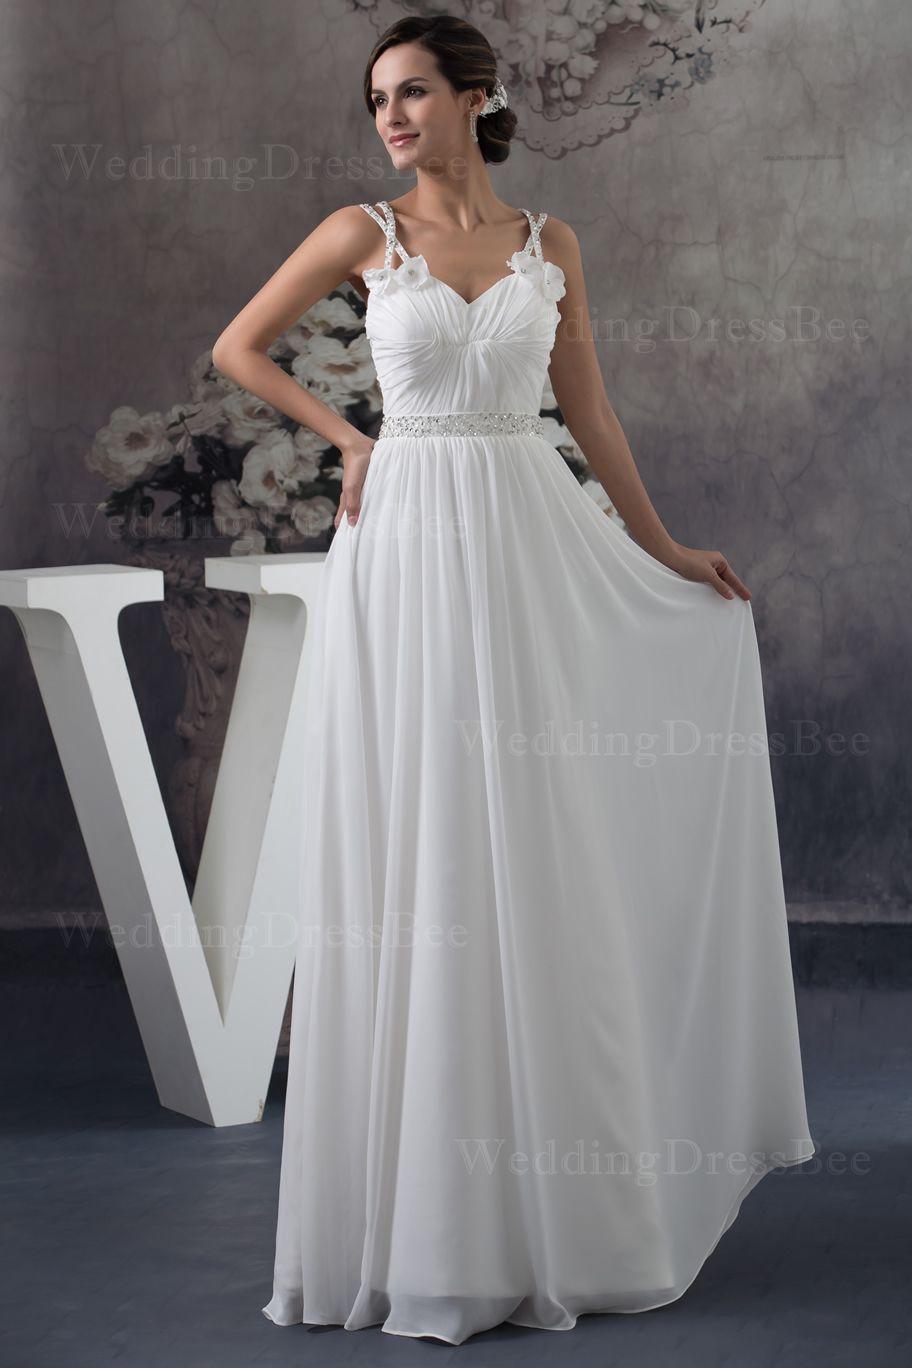 Sweetheart floor length chiffon dress with handmade flowers burlap